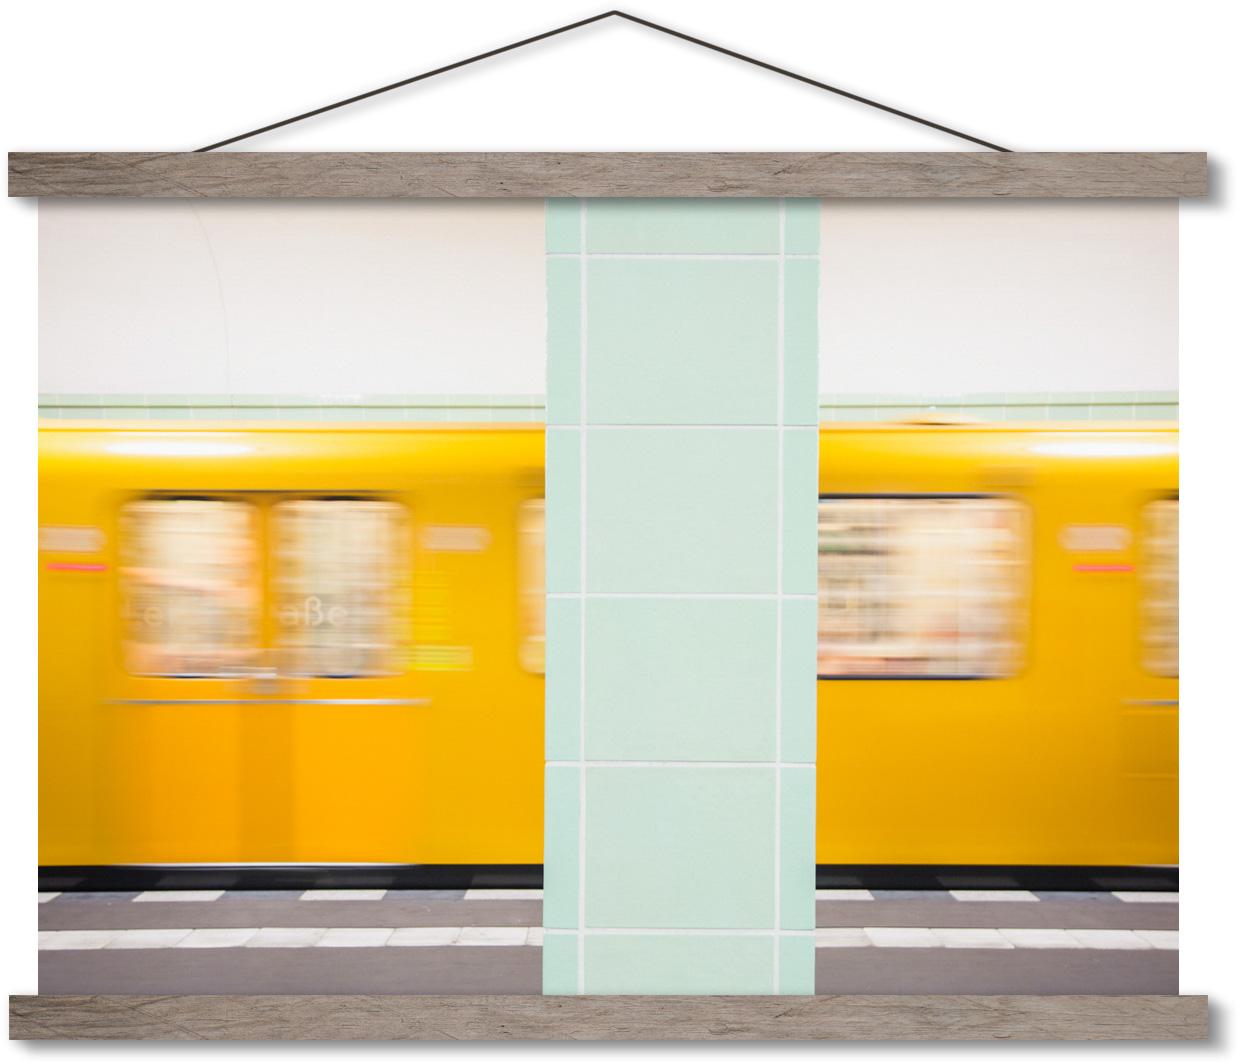 Alexanderplatz metro